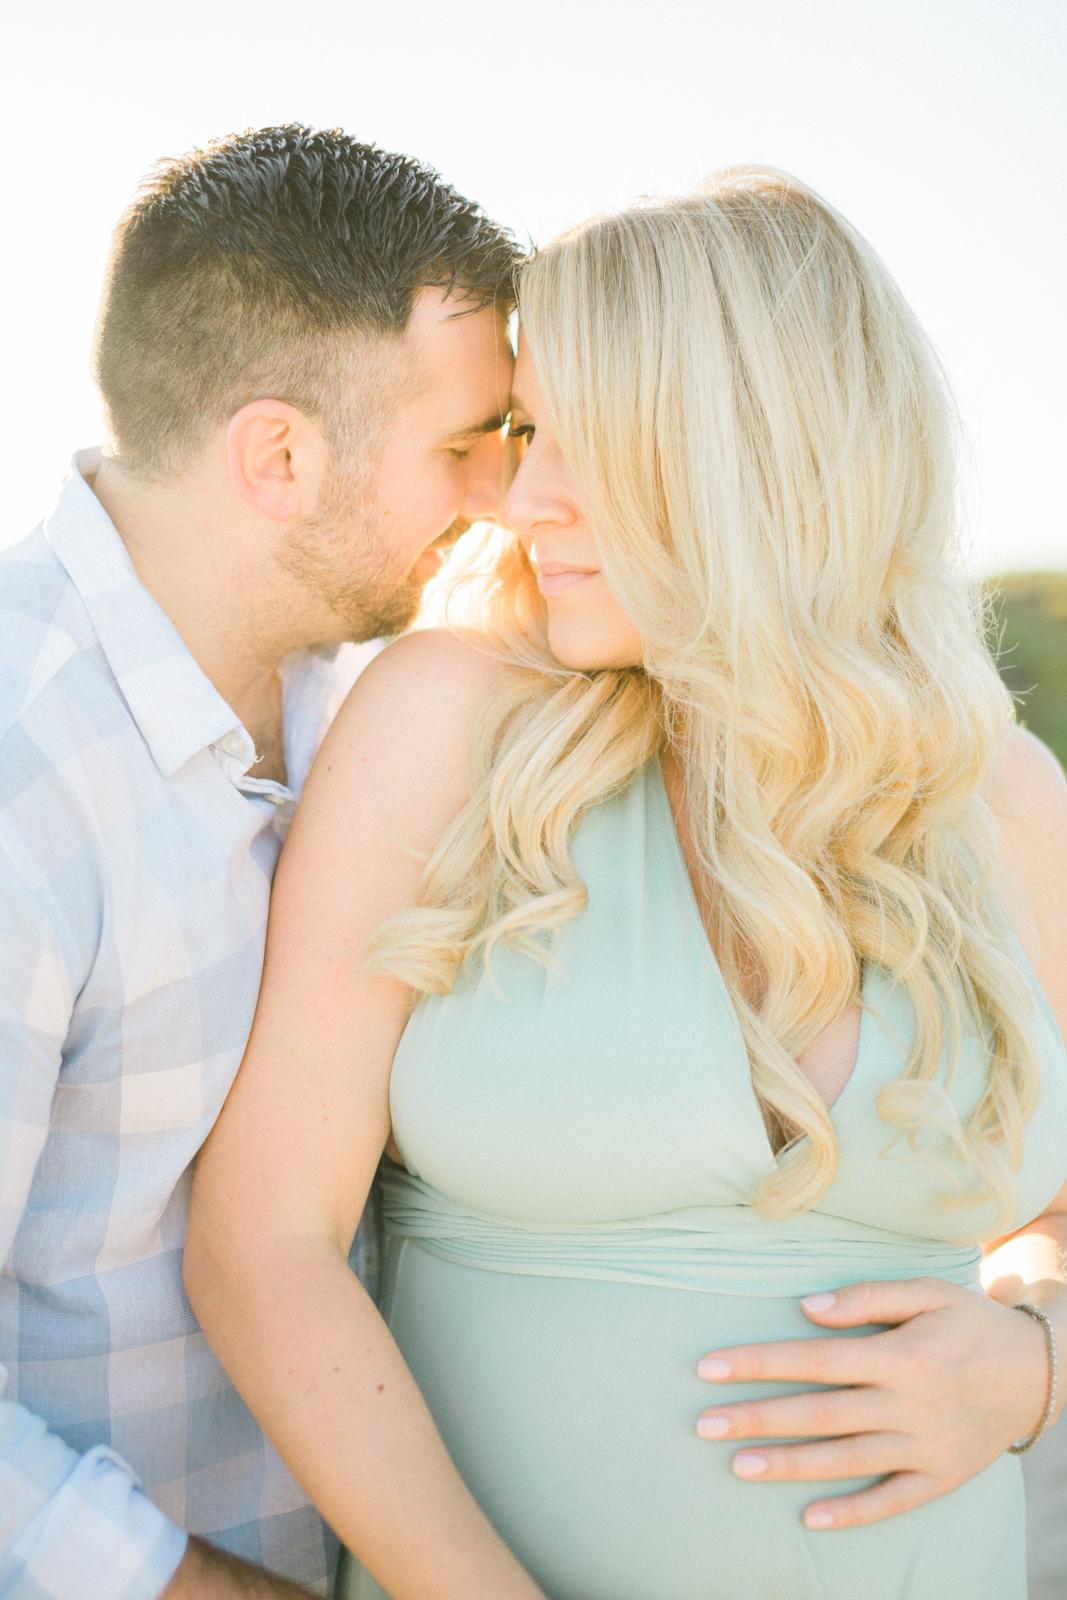 coronado-maternity-photos-5.jpg